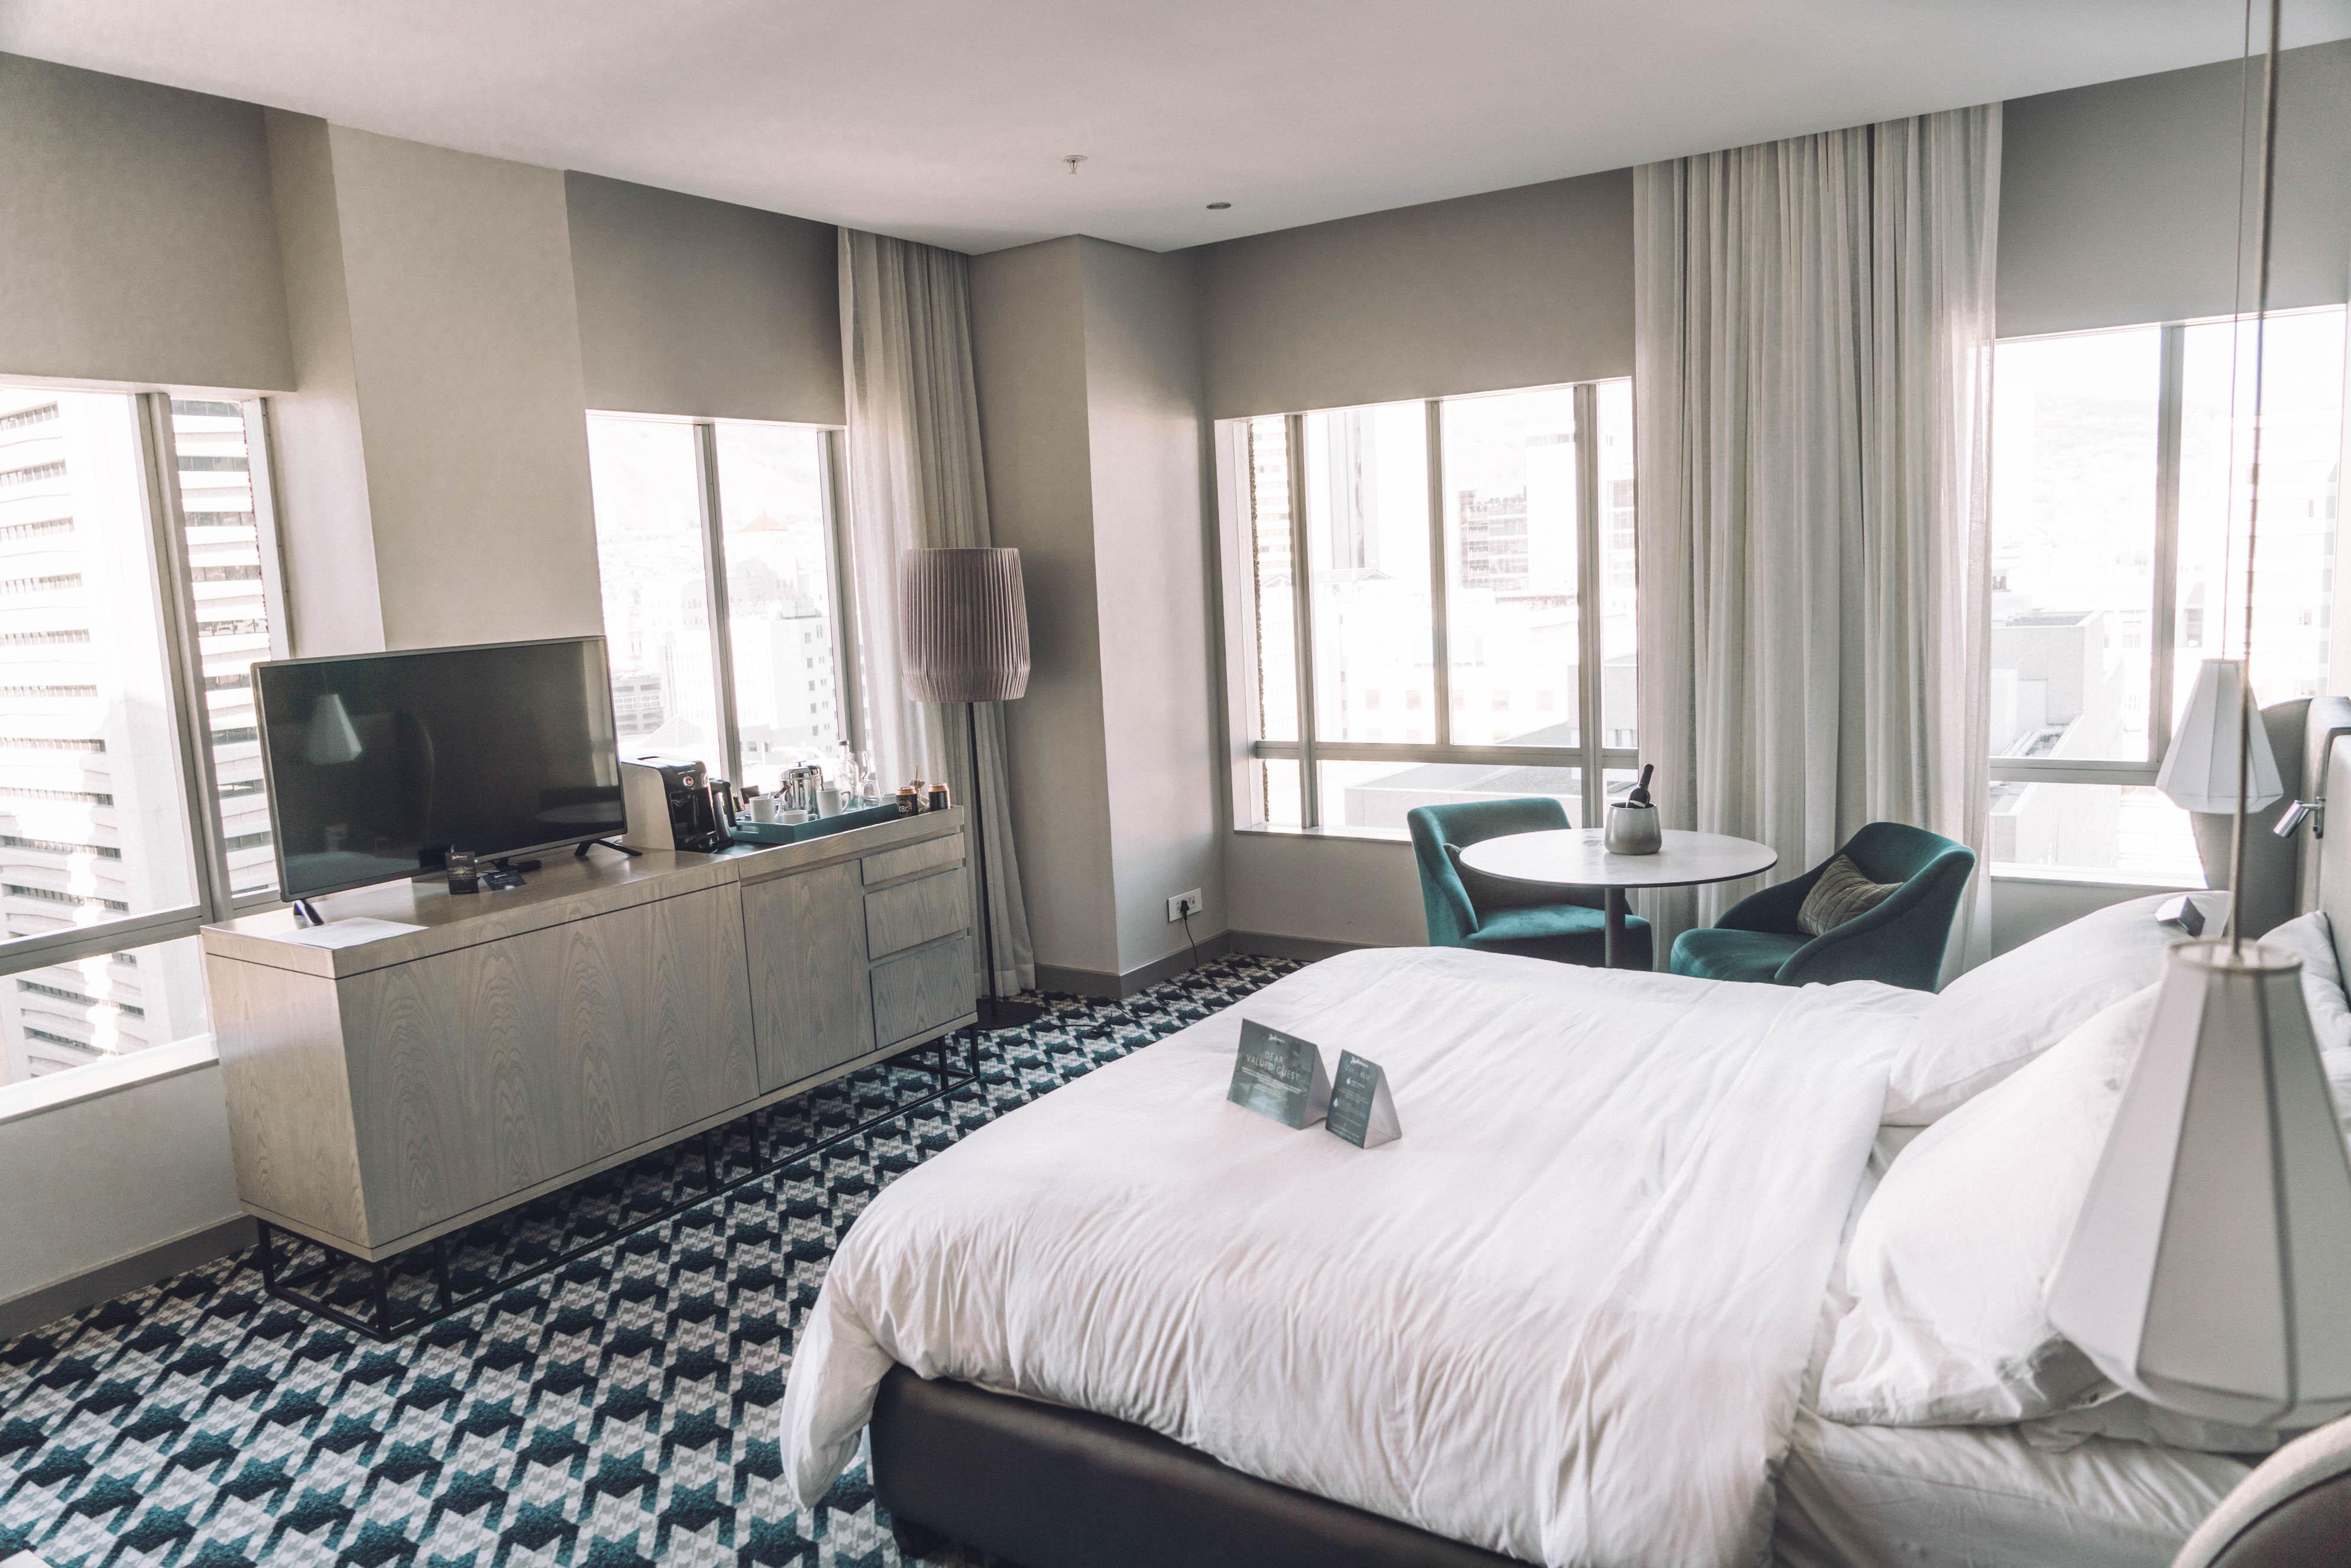 Hotel kamer Kaapstad